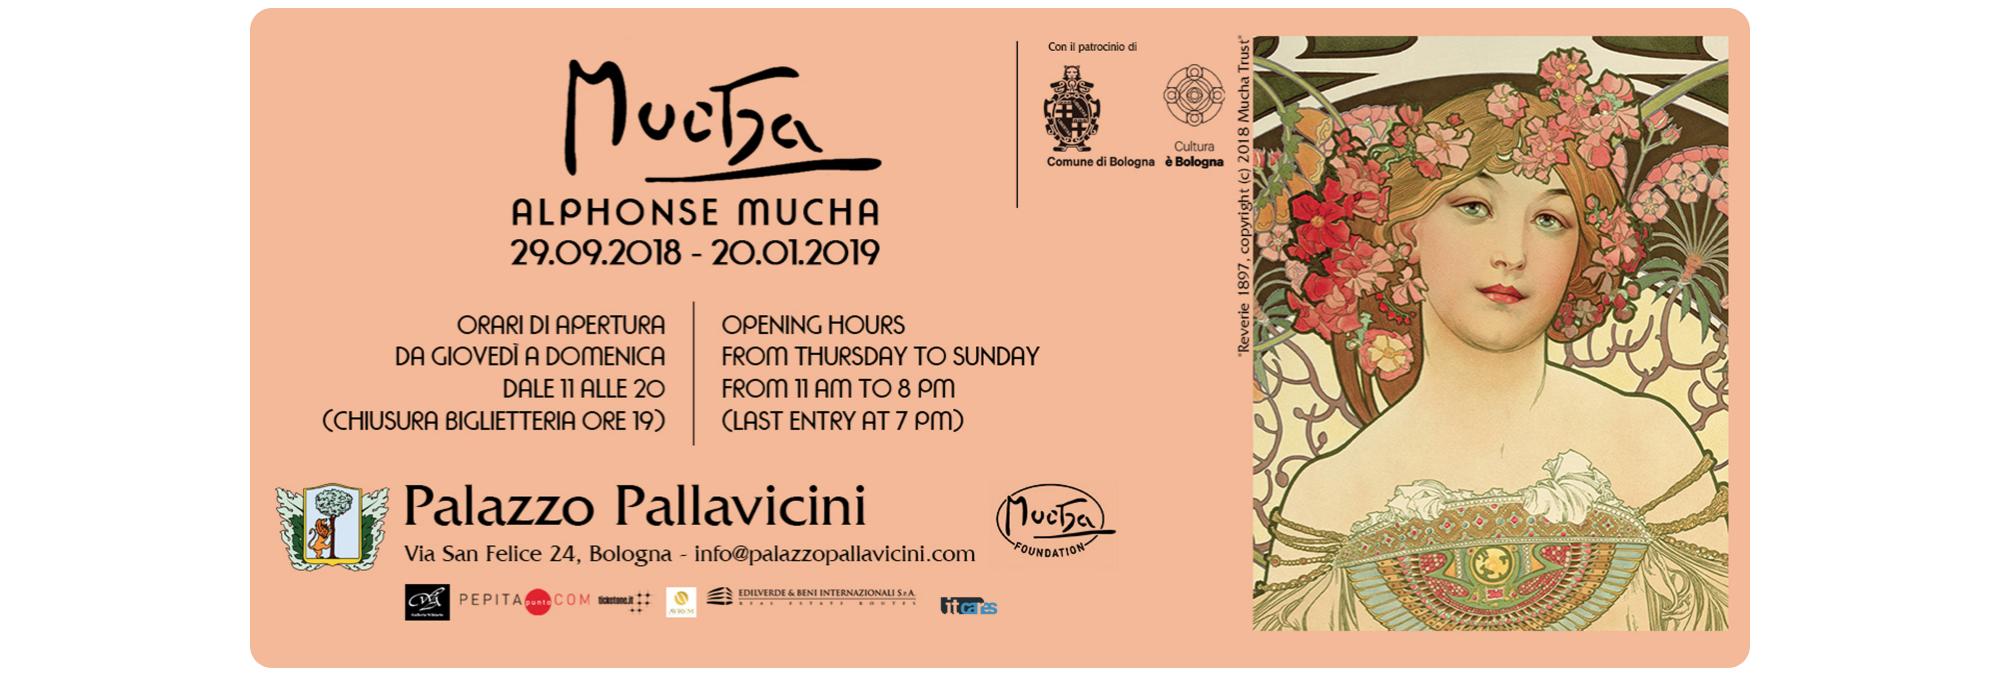 Banner della mostra Alphonse Mucha